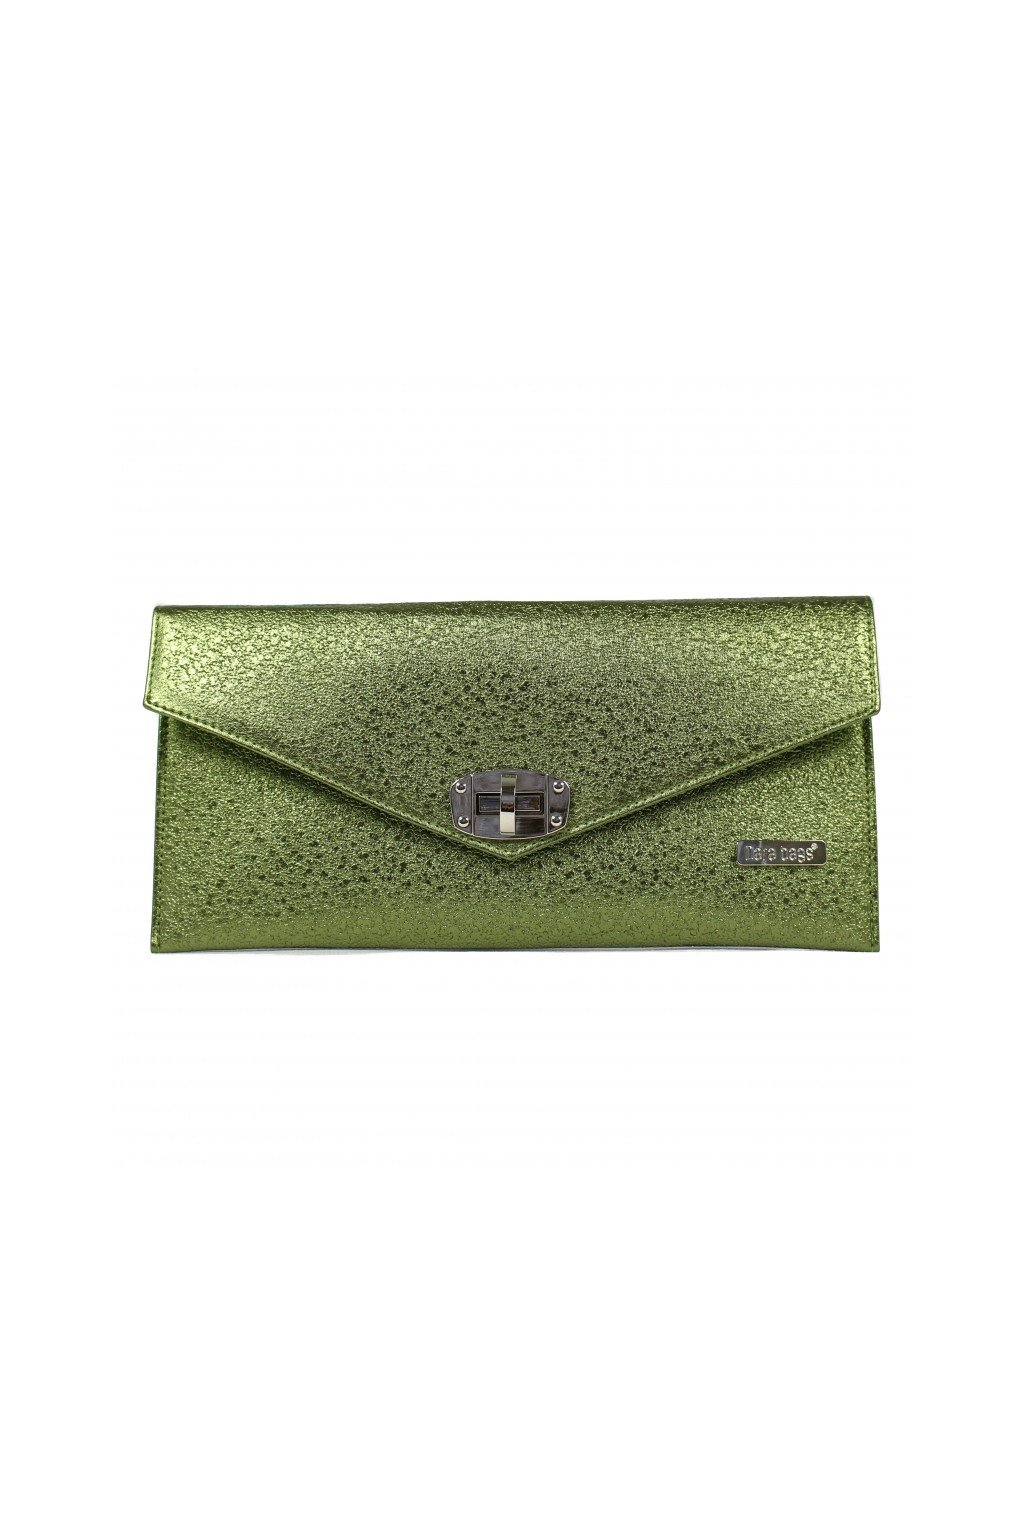 Mala trpytiva kabelka Malibu Classy Dara bags zelena 1